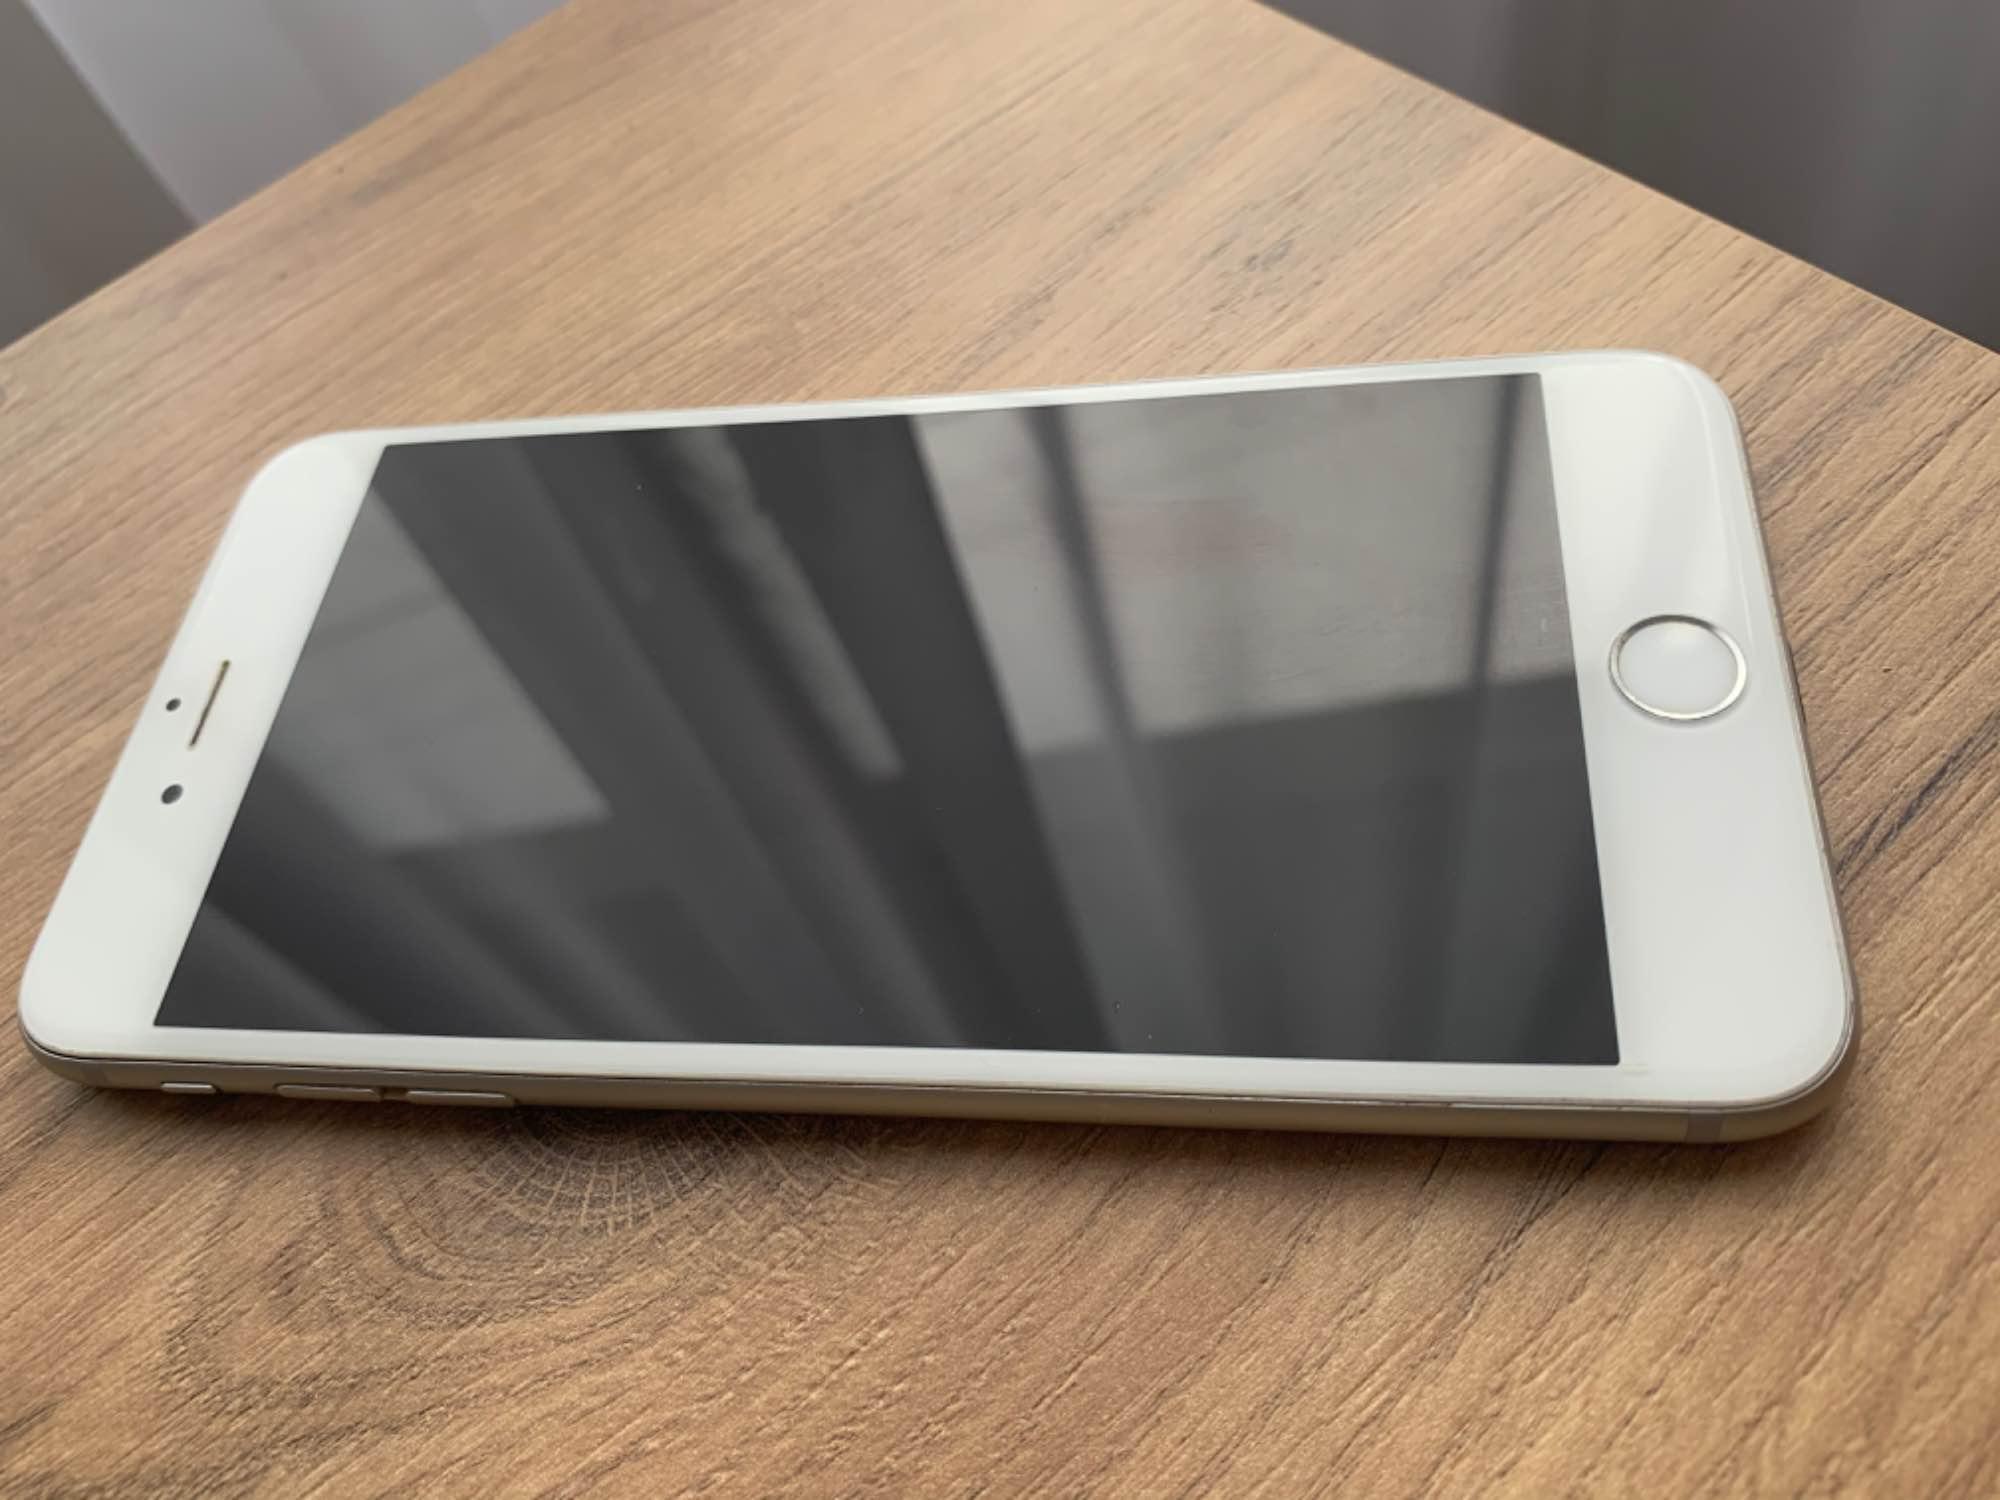 Telefon iPhone 6s Plus 16GB Lubawa - zdjęcie 2